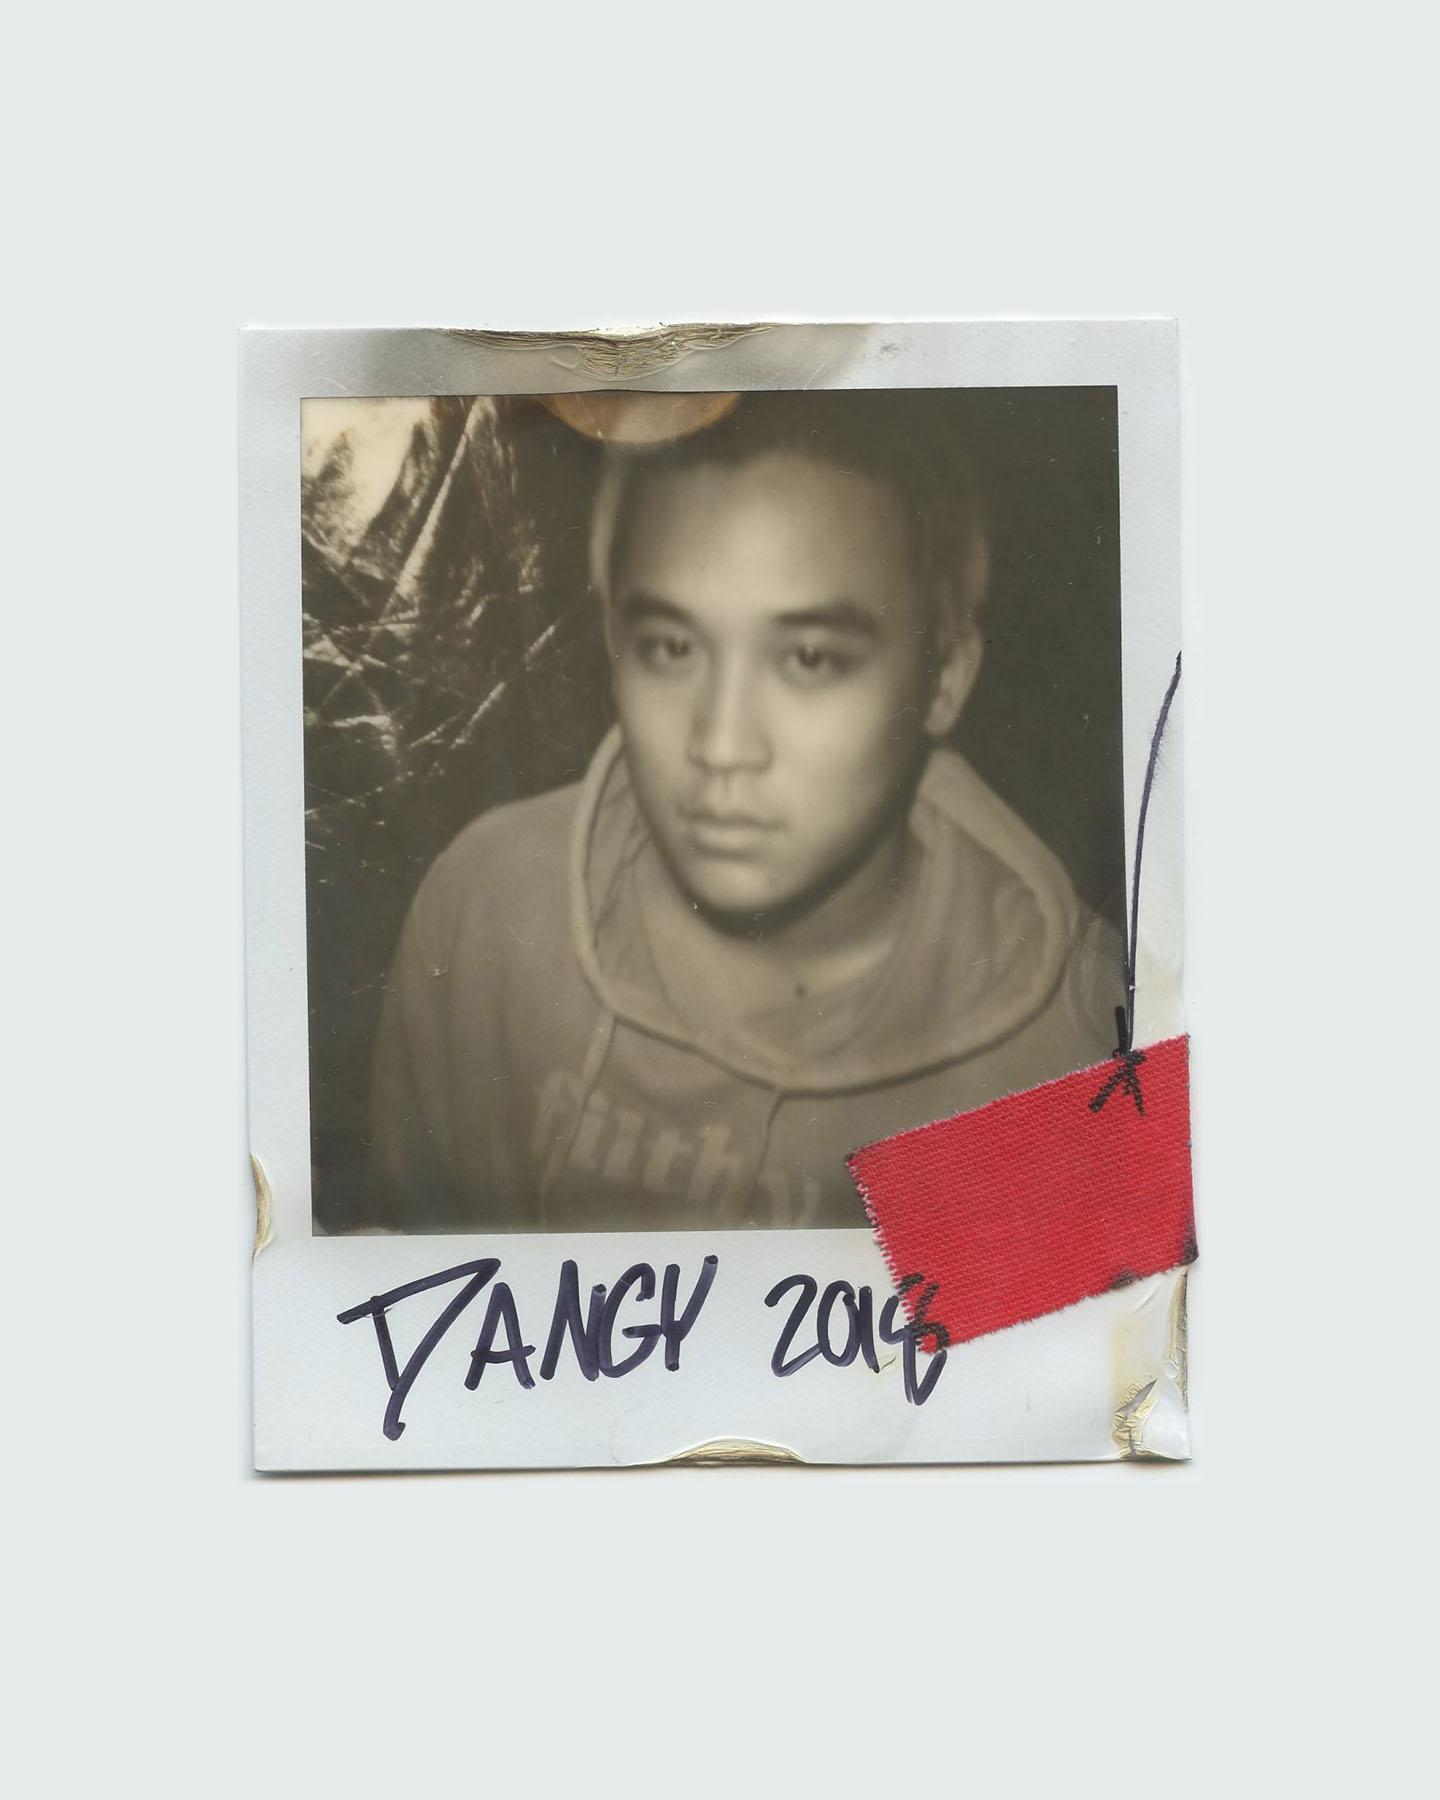 1_dangy